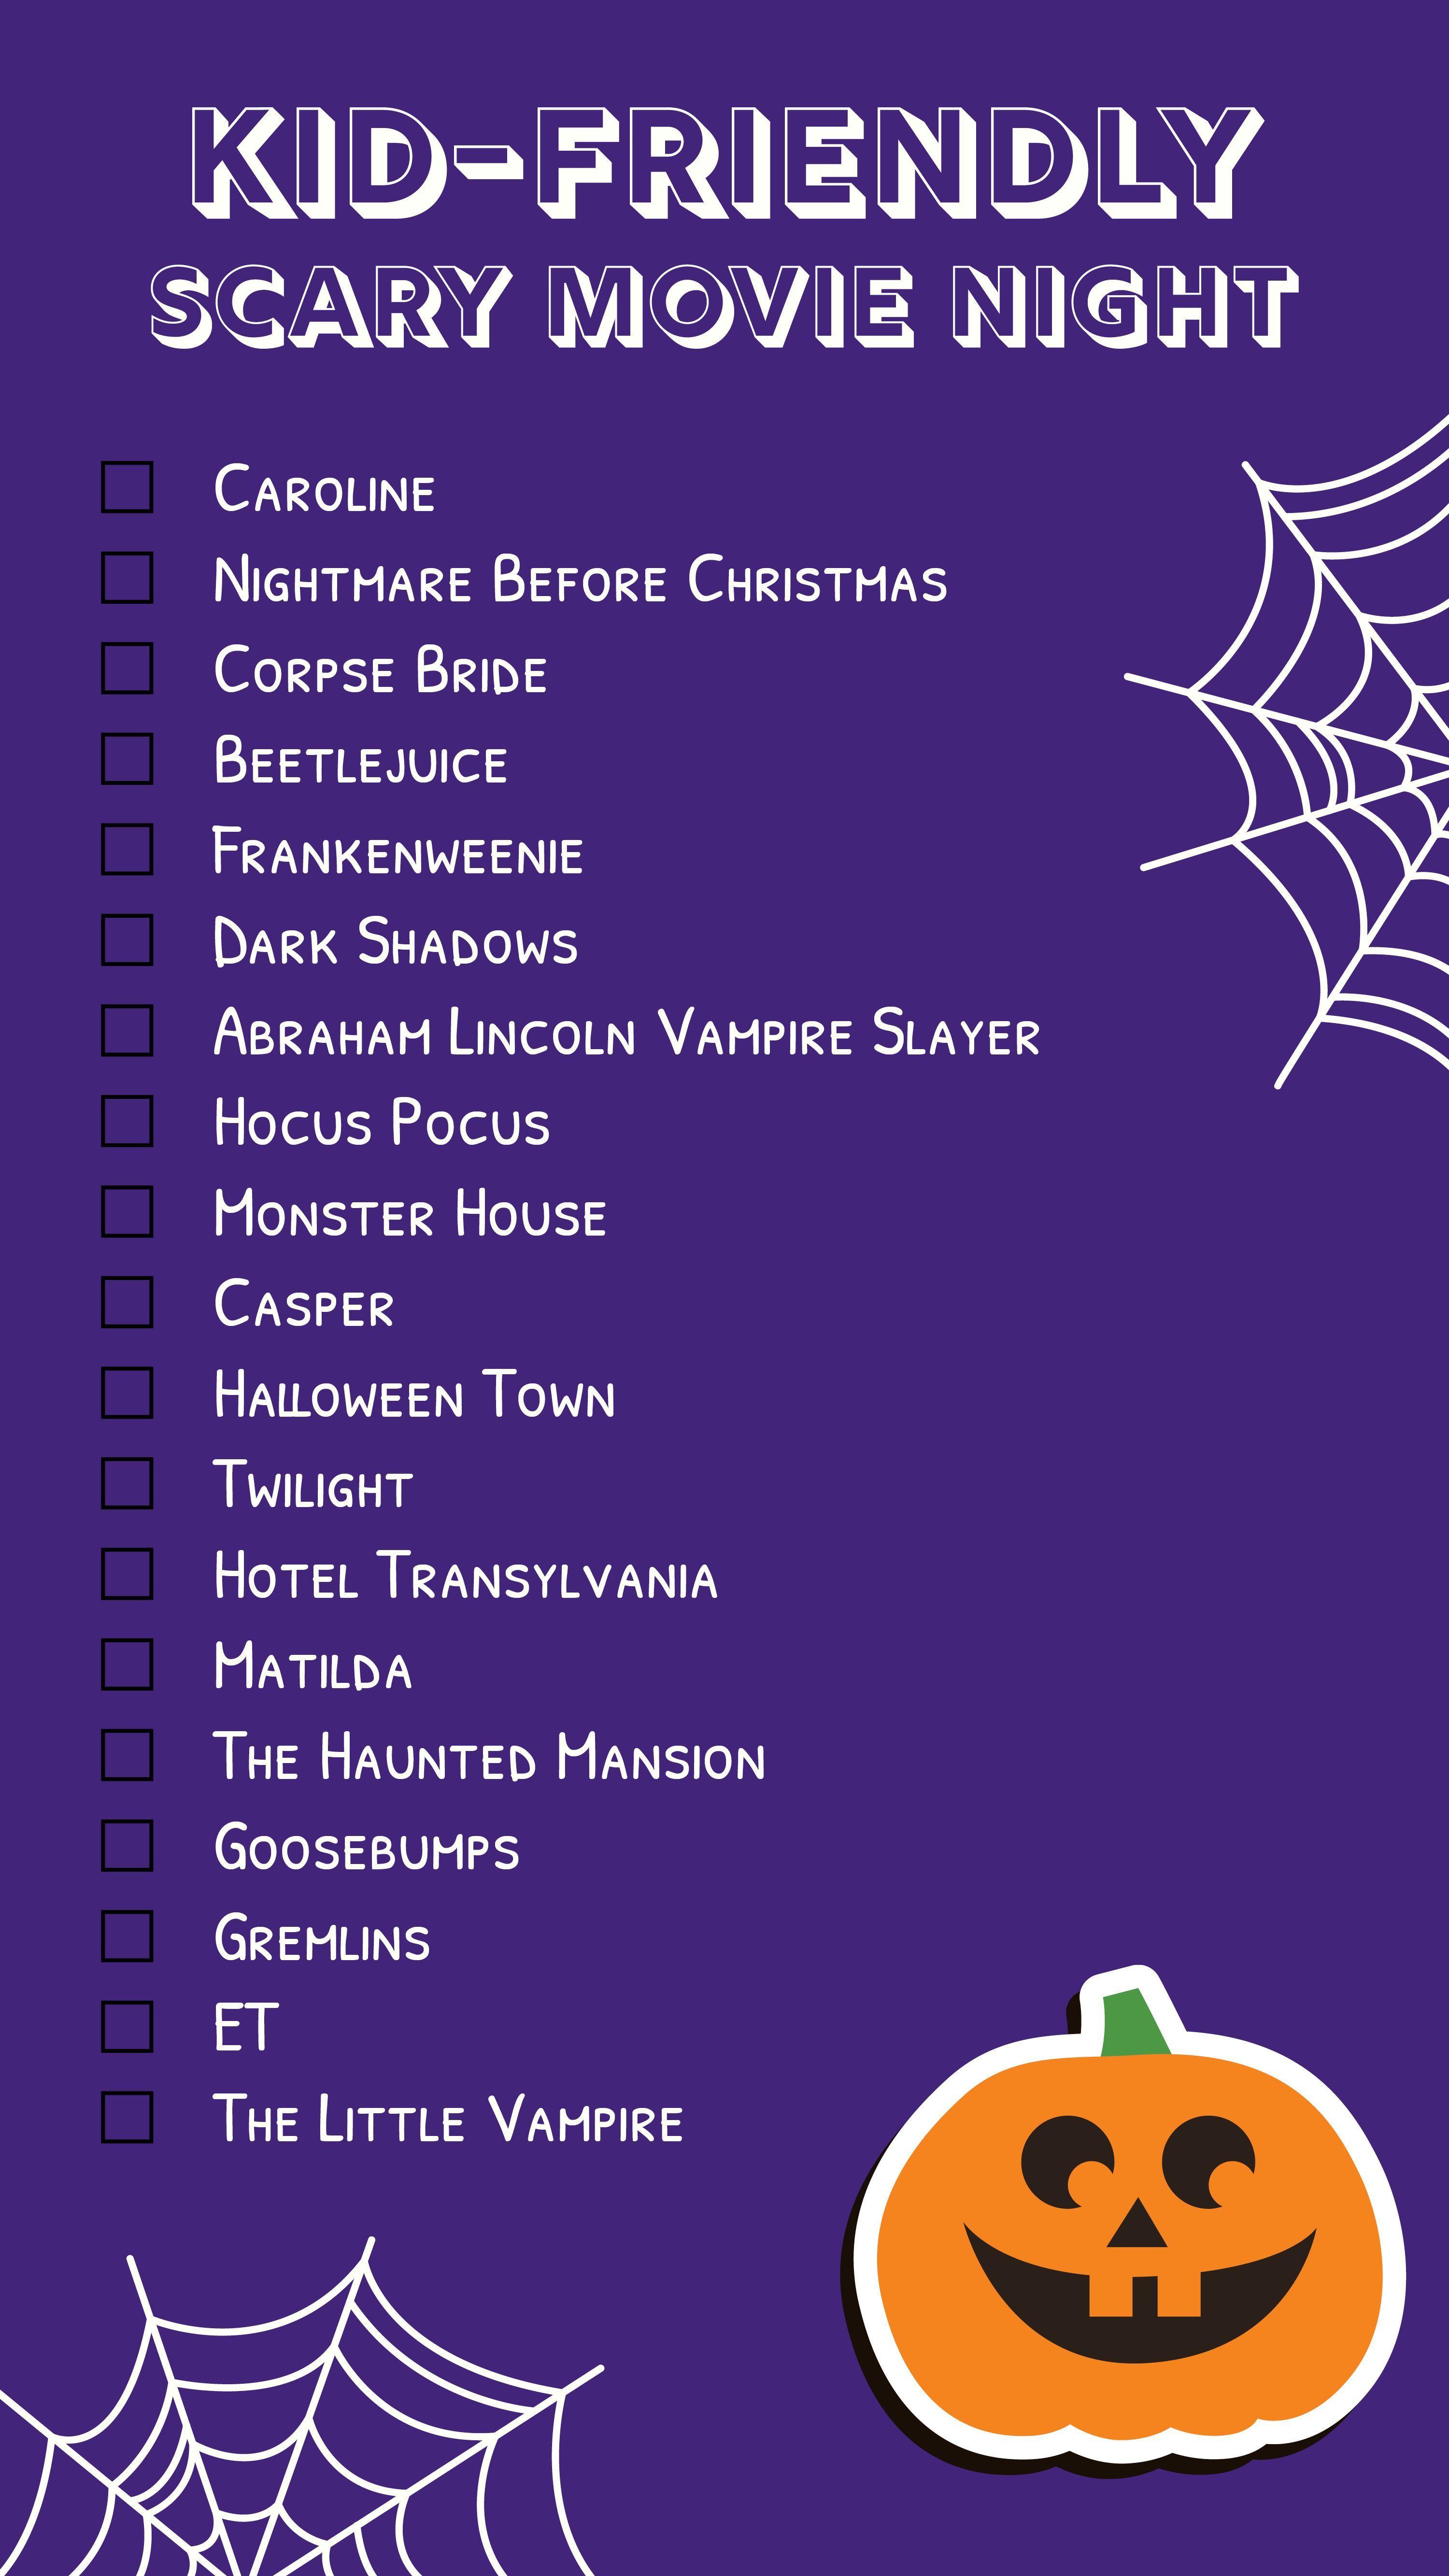 Kid Friendly Halloween Movies kidscarymovienight